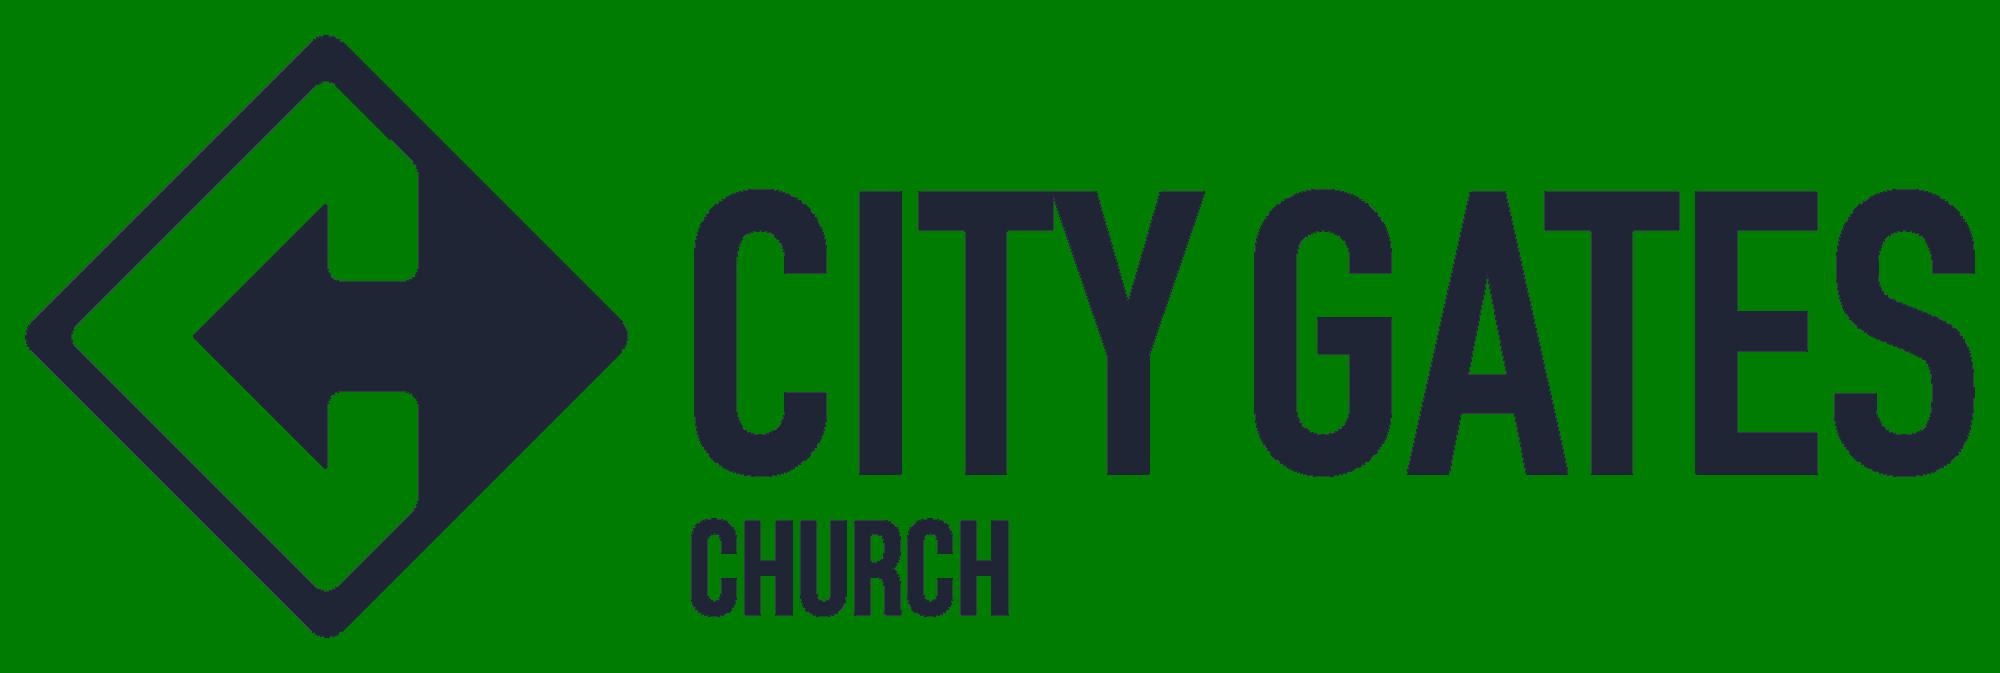 City Gates Church